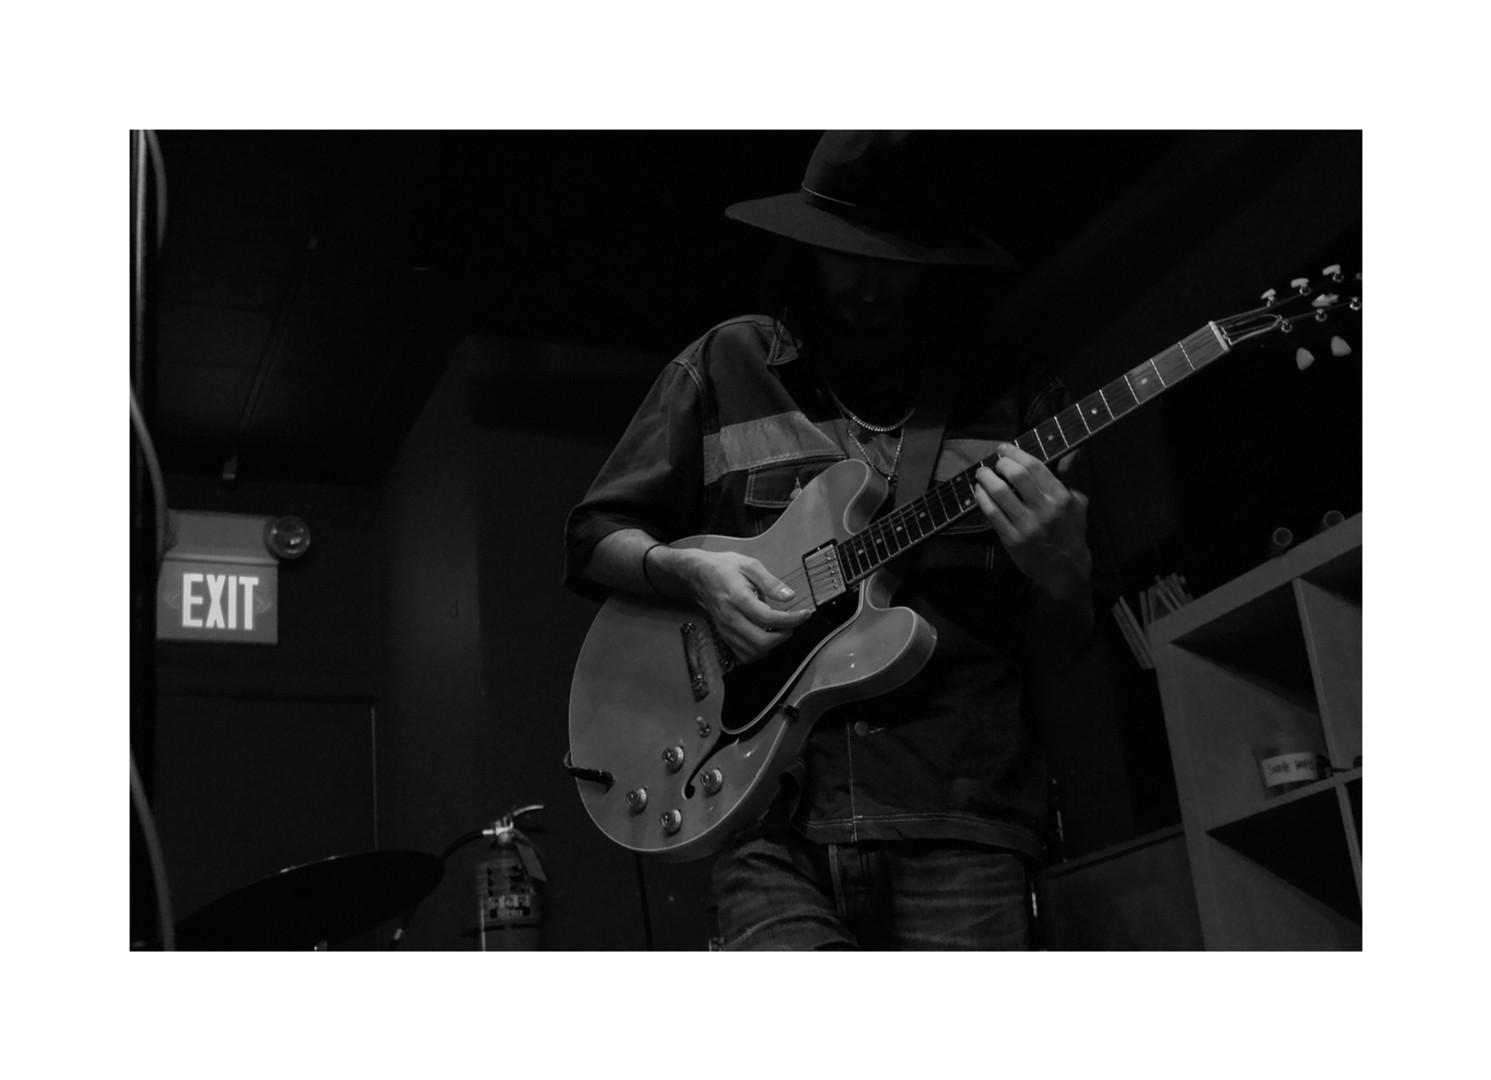 guitarlitlit.jpg